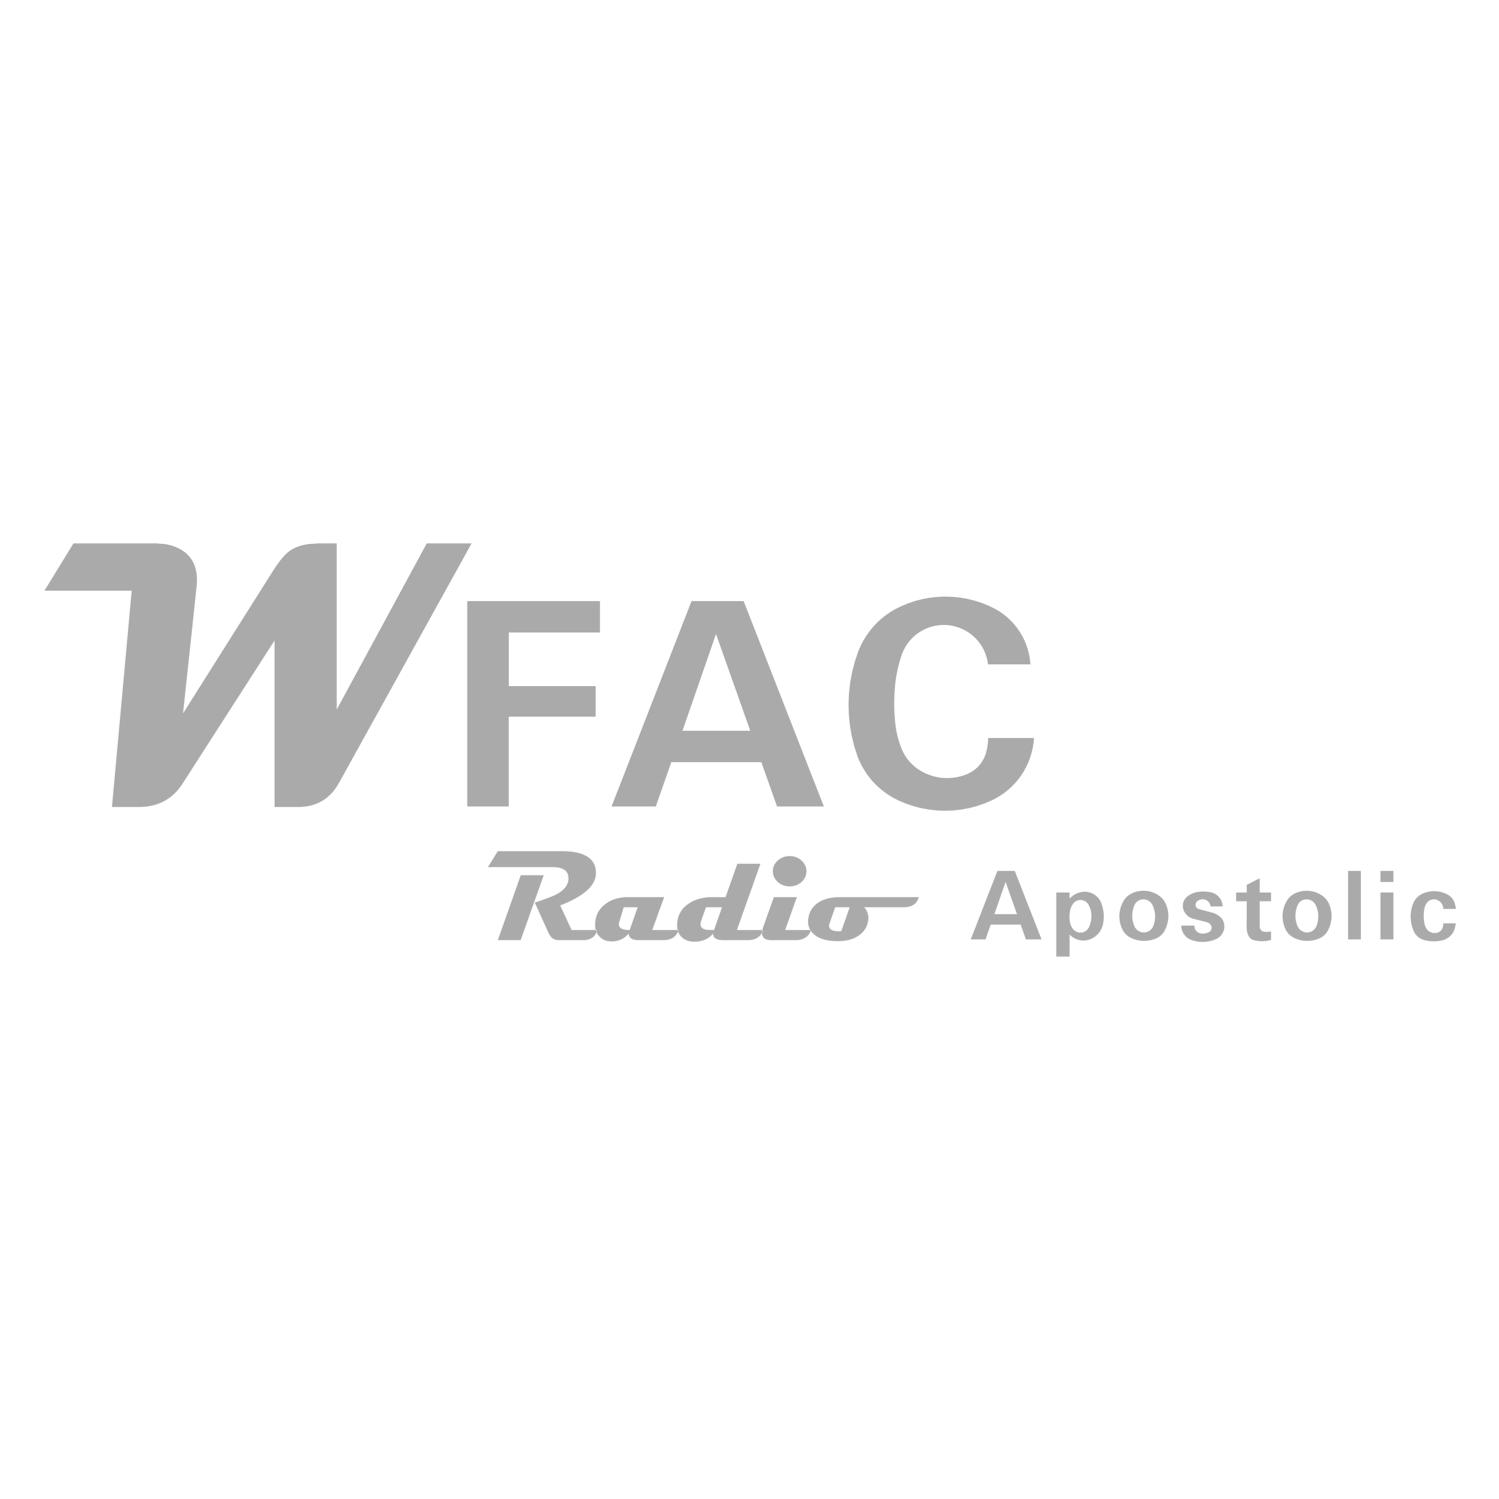 WFAC Radio Apostolic